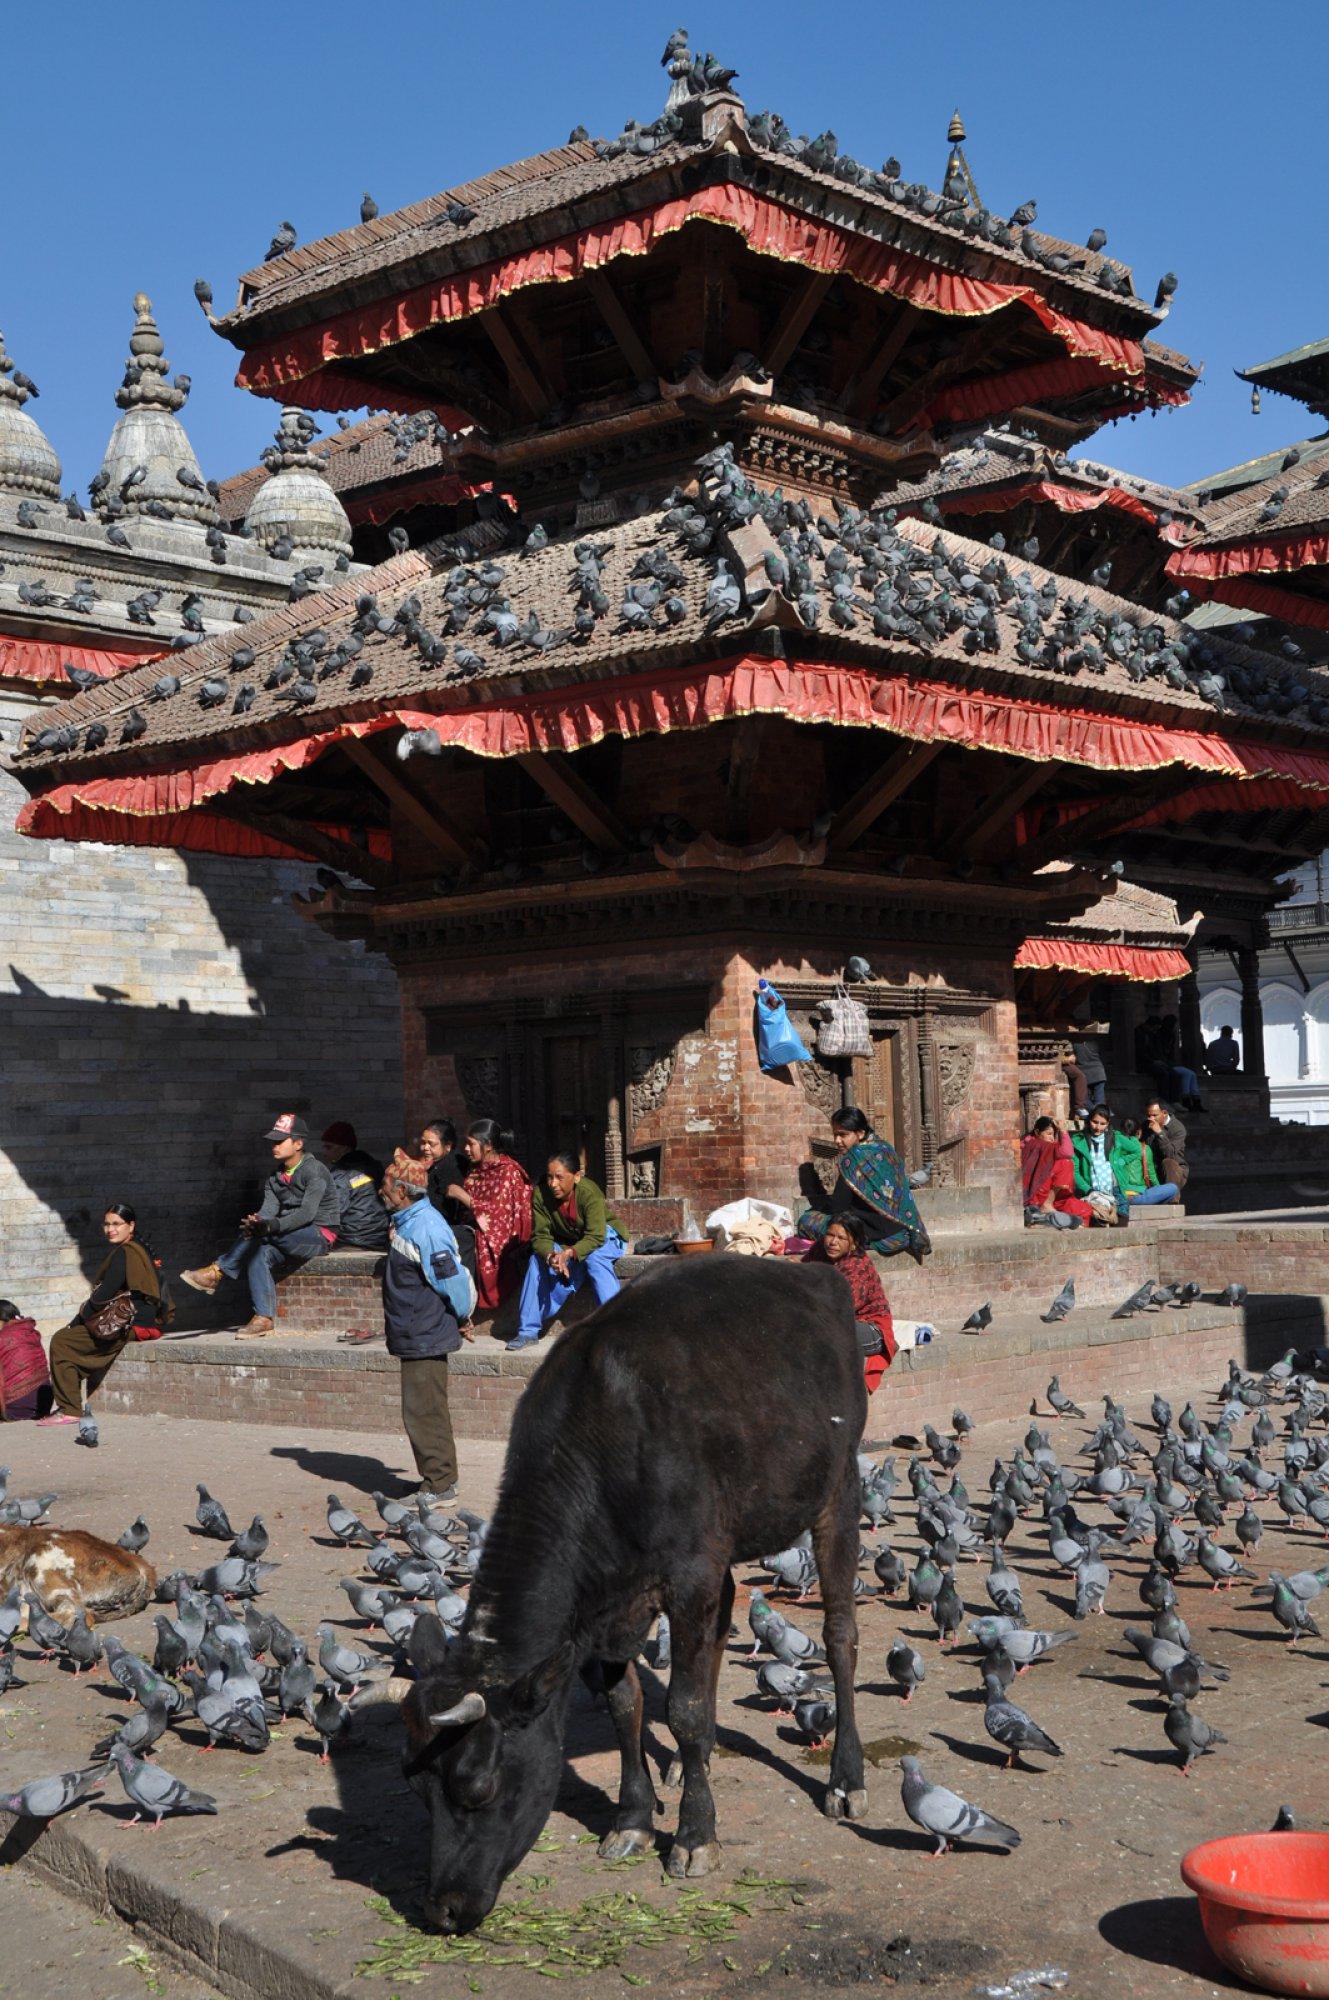 https://bubo.sk/uploads/galleries/16319/nepal-kathmandu-tomas-kubus.jpg